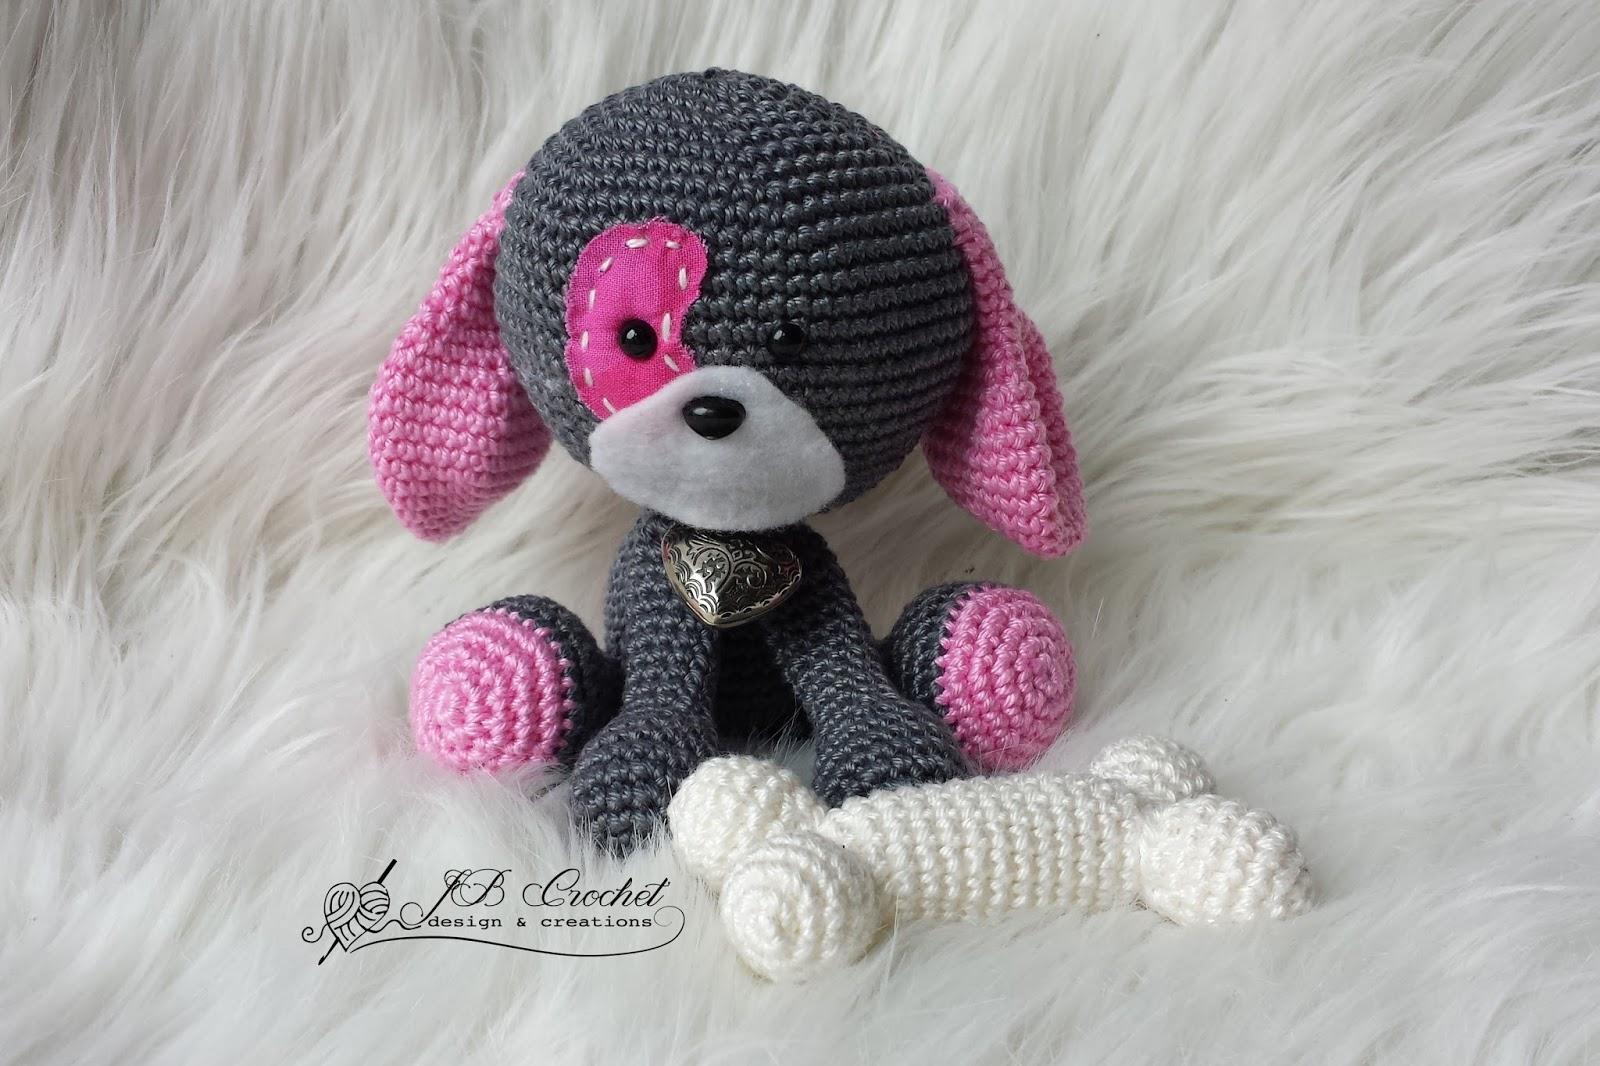 Jb Crochet Design Creations Hondje Domino